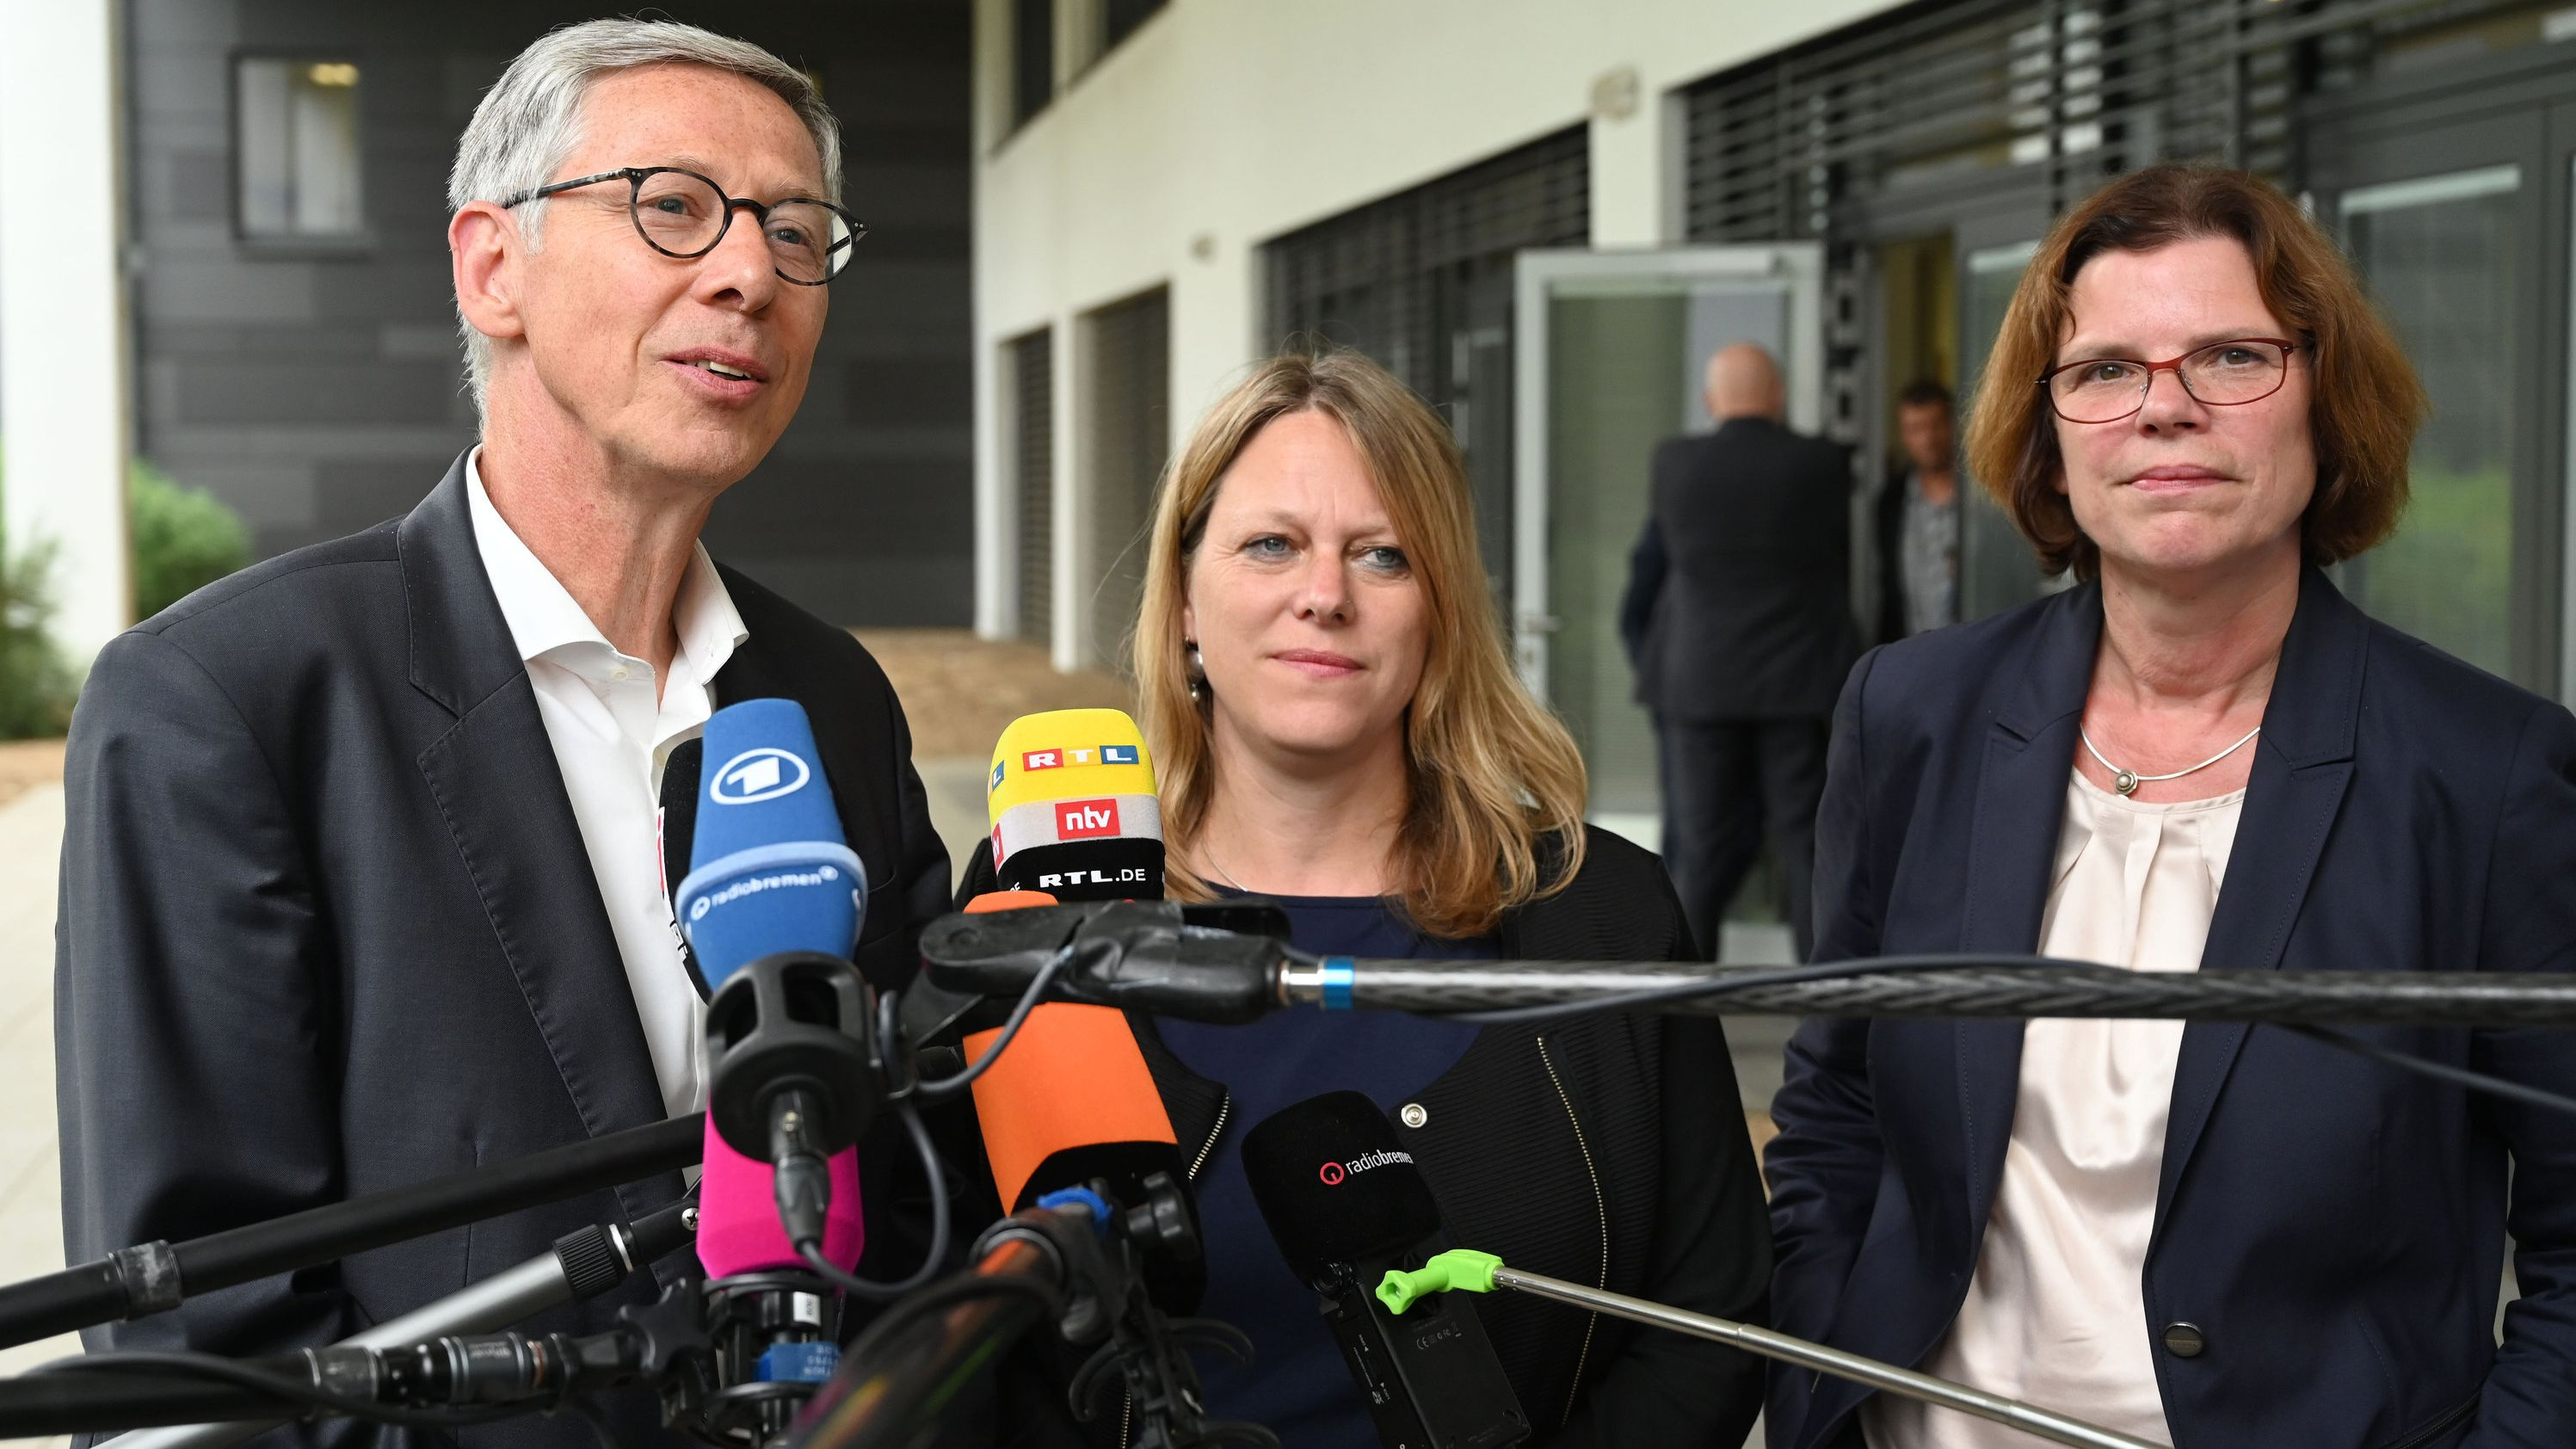 Carsten Sieling (SPD), Maike Schaefer (B90/Grüne) und Kristina Vogt (Die Linke)